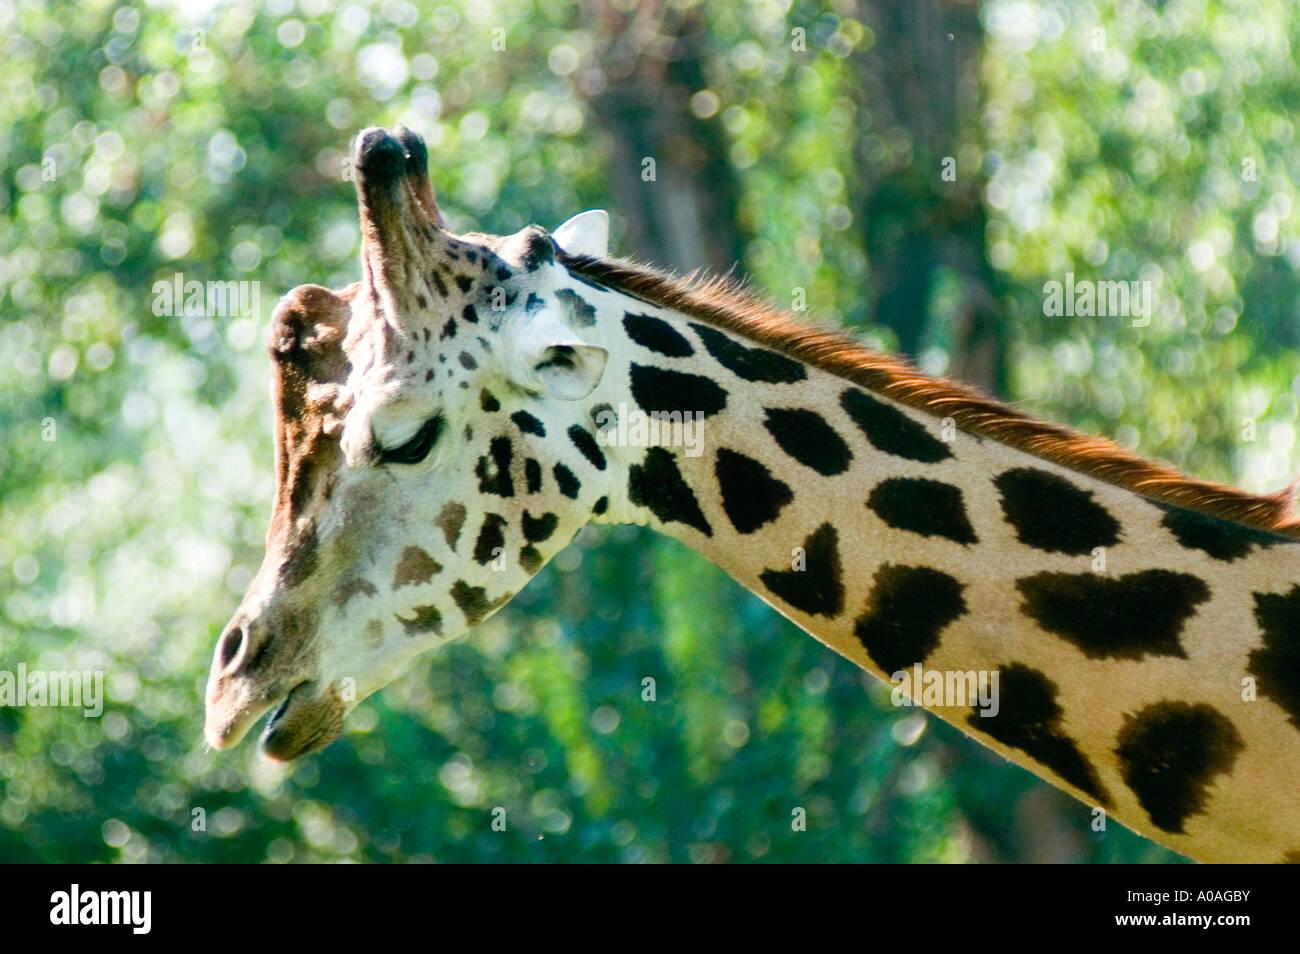 Baringo Giraffe Giraffa camelopardalis rothschild - Stock Image